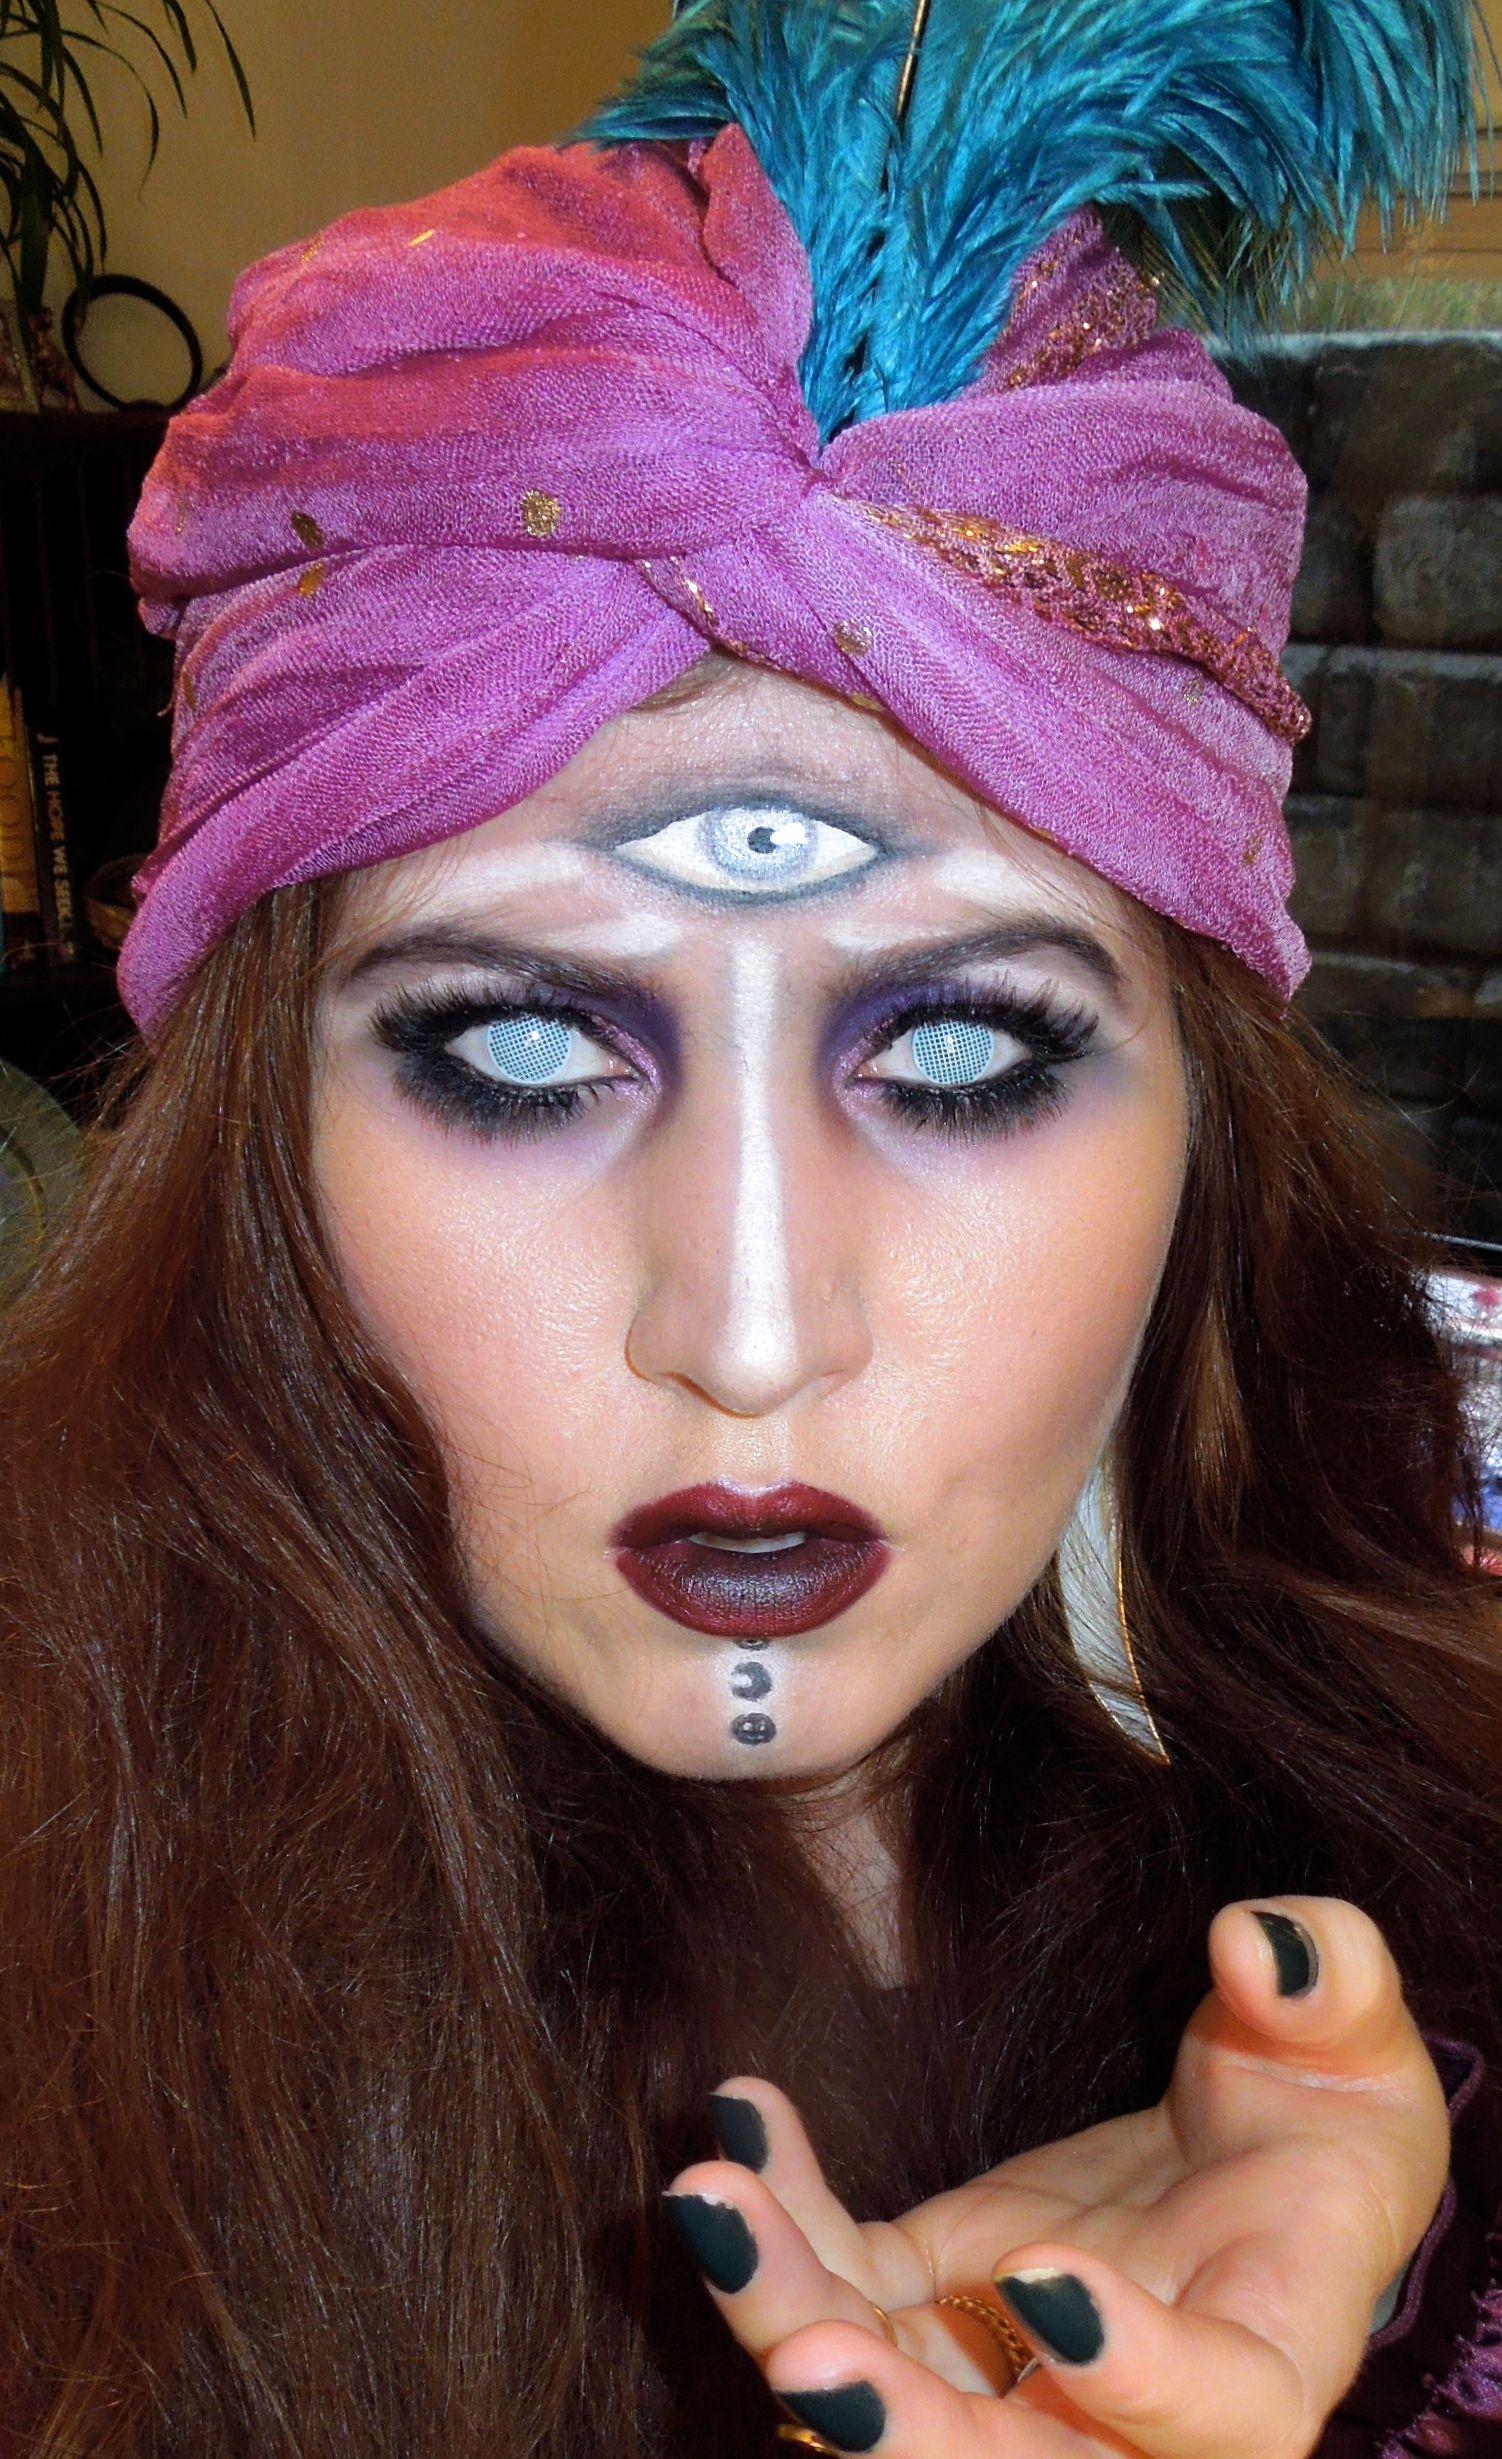 halloween#costume#pirate | ☠ ℋαɾṿεѕт αṉḋ ℋαυṉтѕ ☠ | Pinterest ...